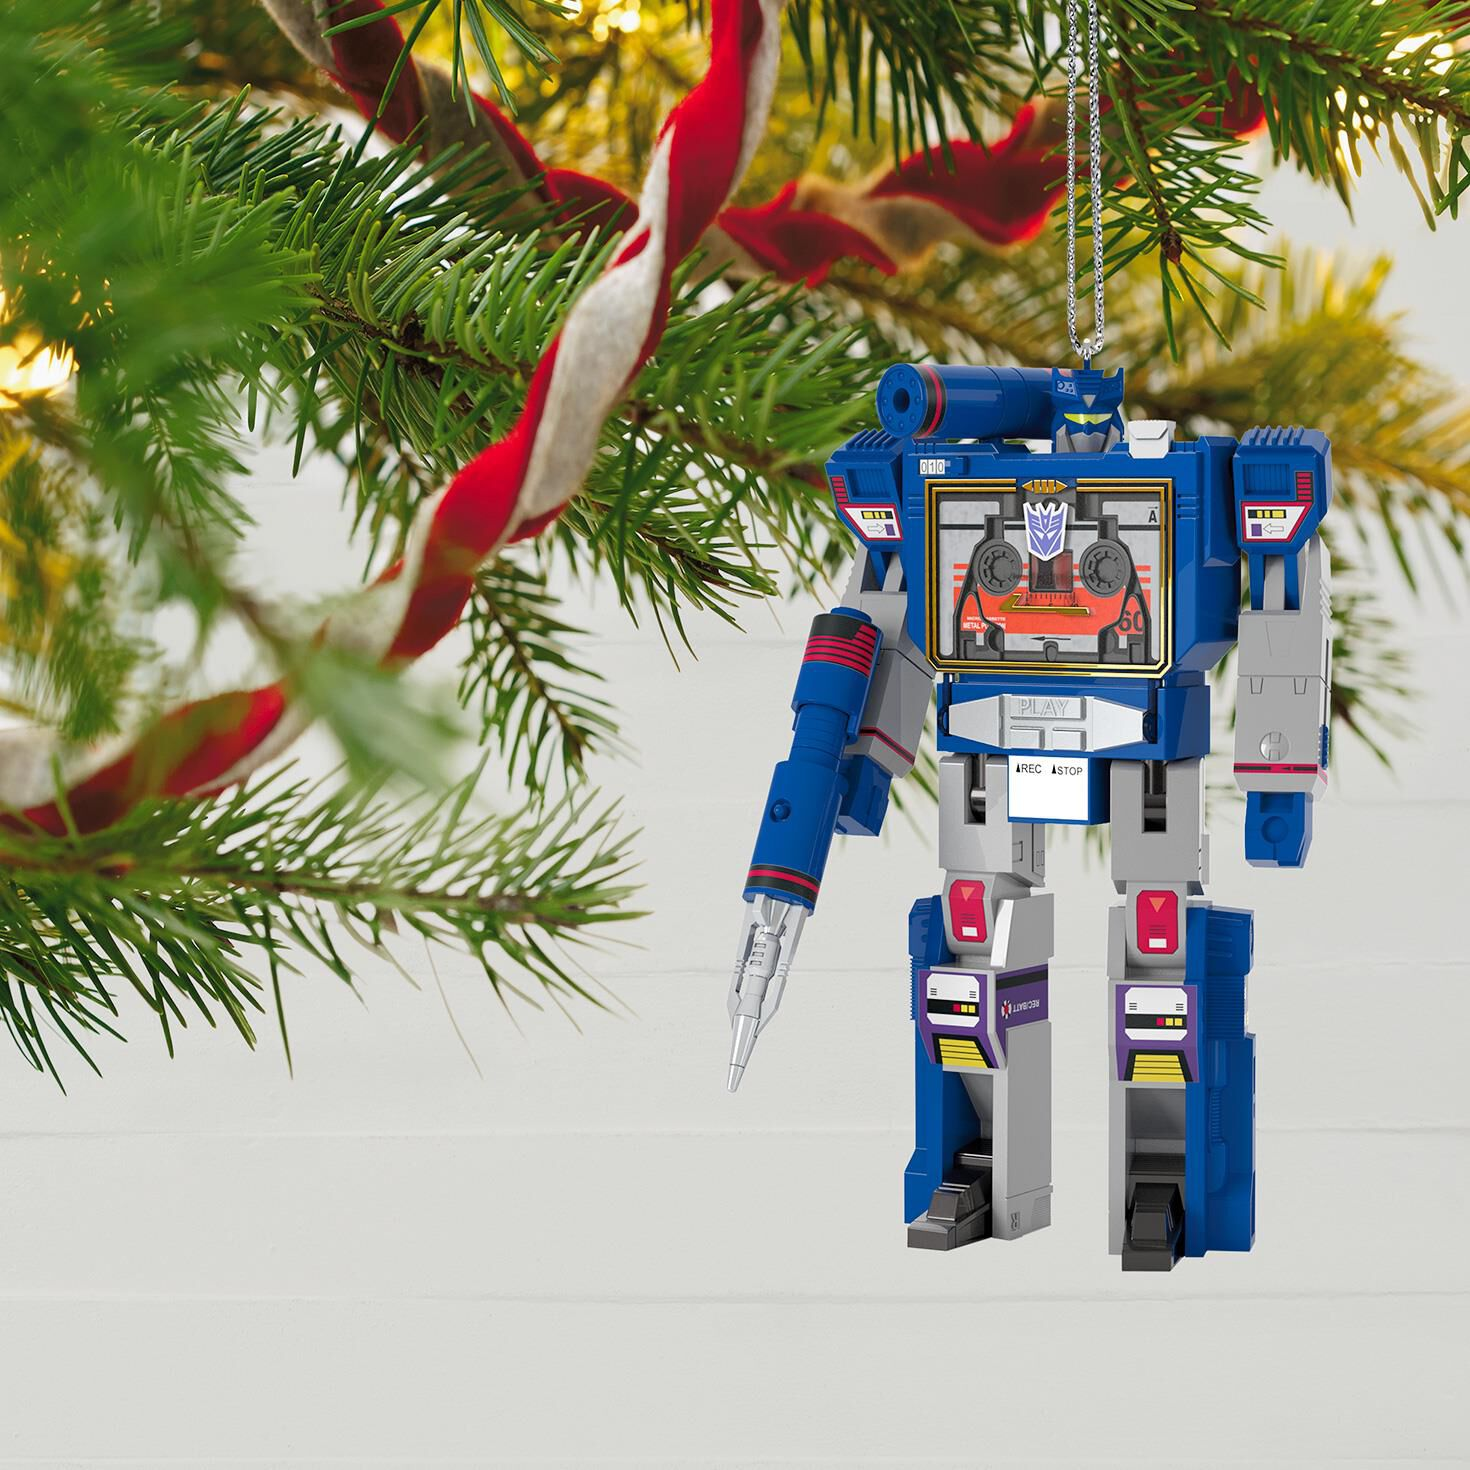 Transformers Soundwave Ornament - Keepsake Ornaments - Hallmark